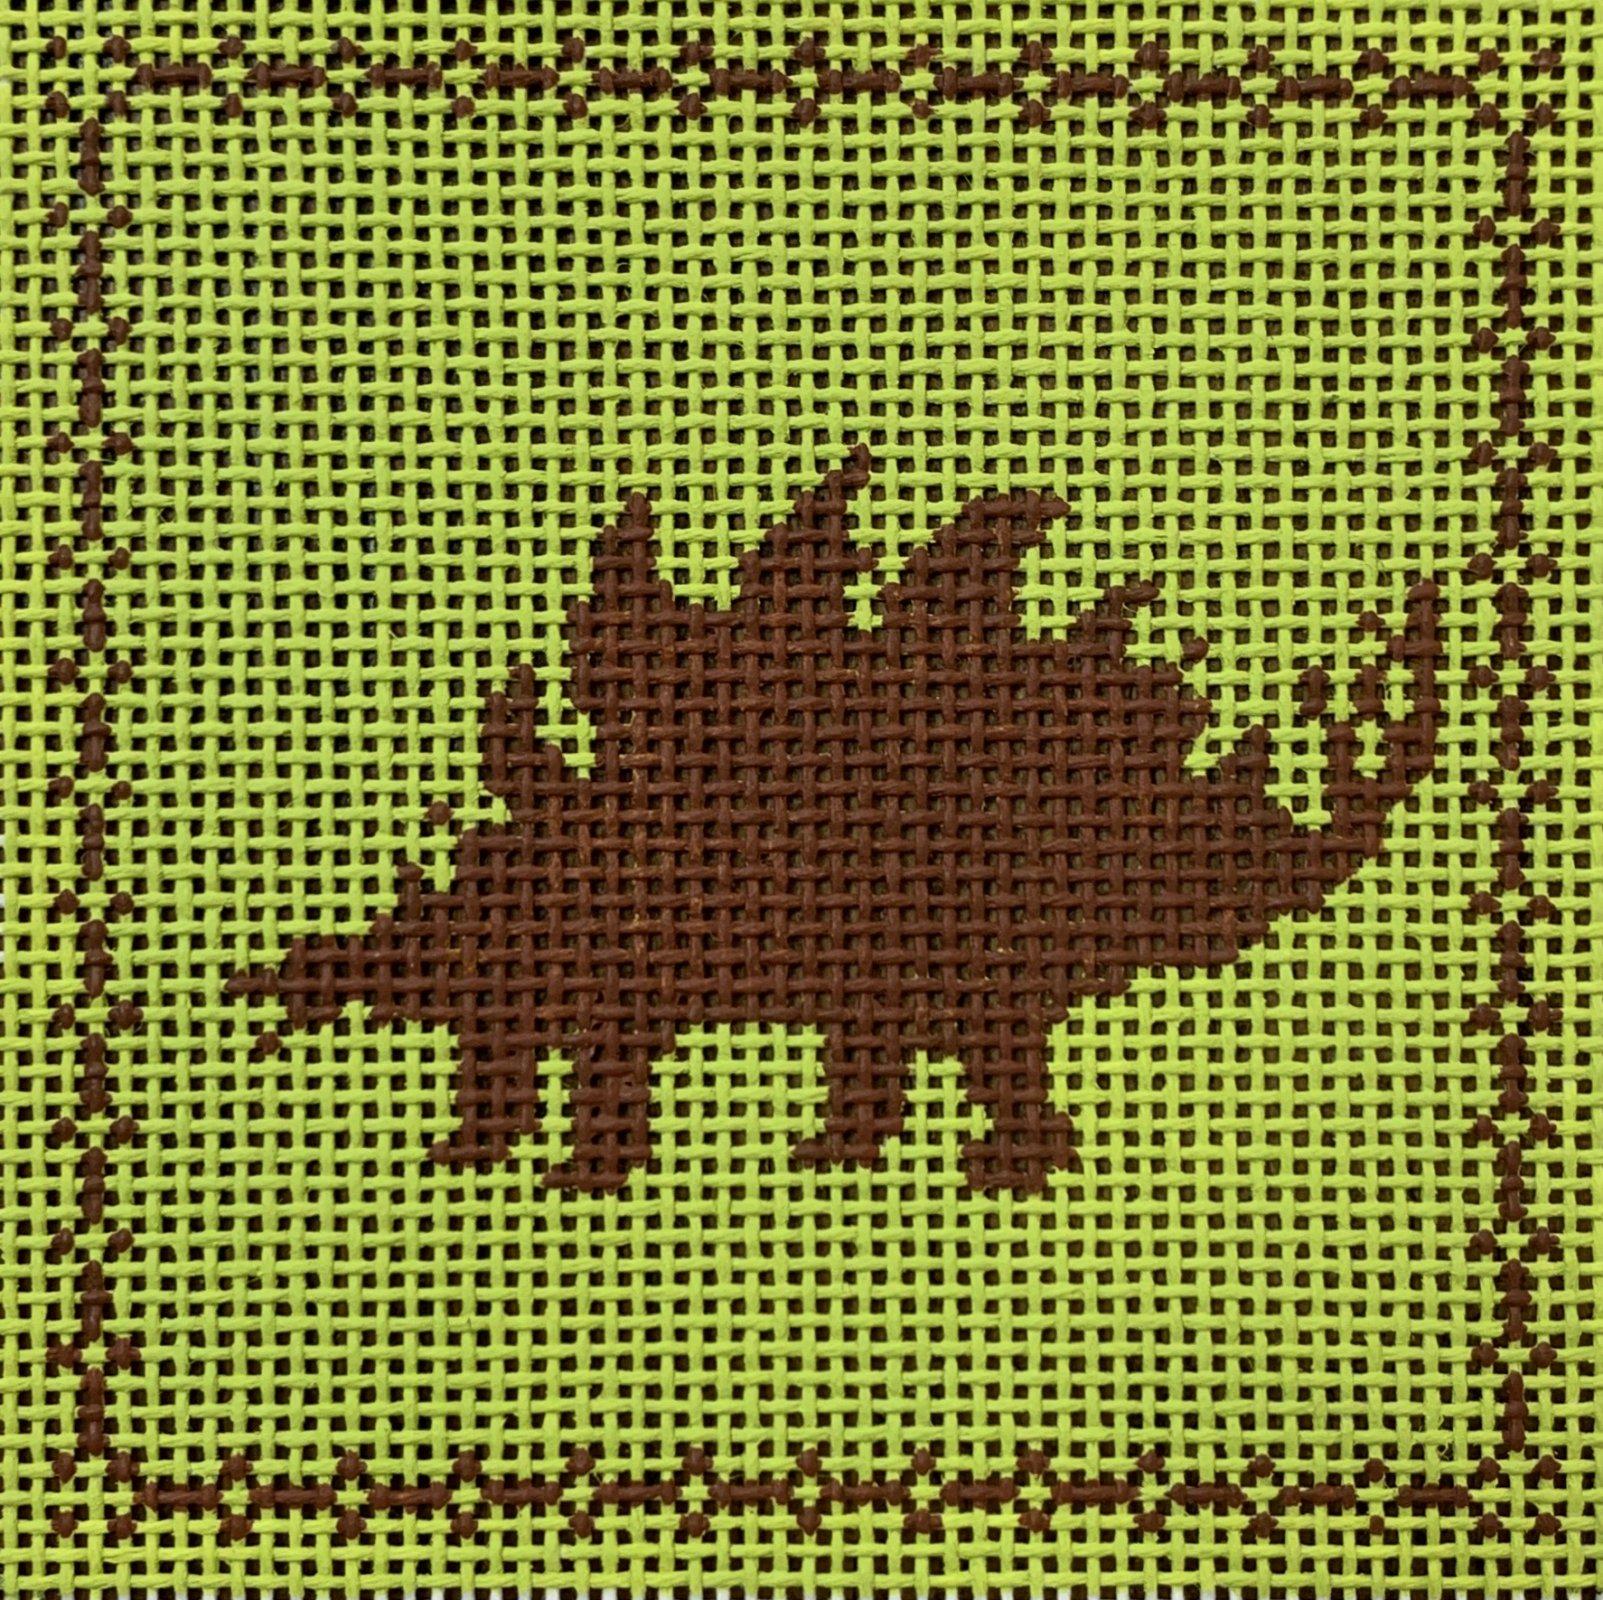 B/G Stegosaurus